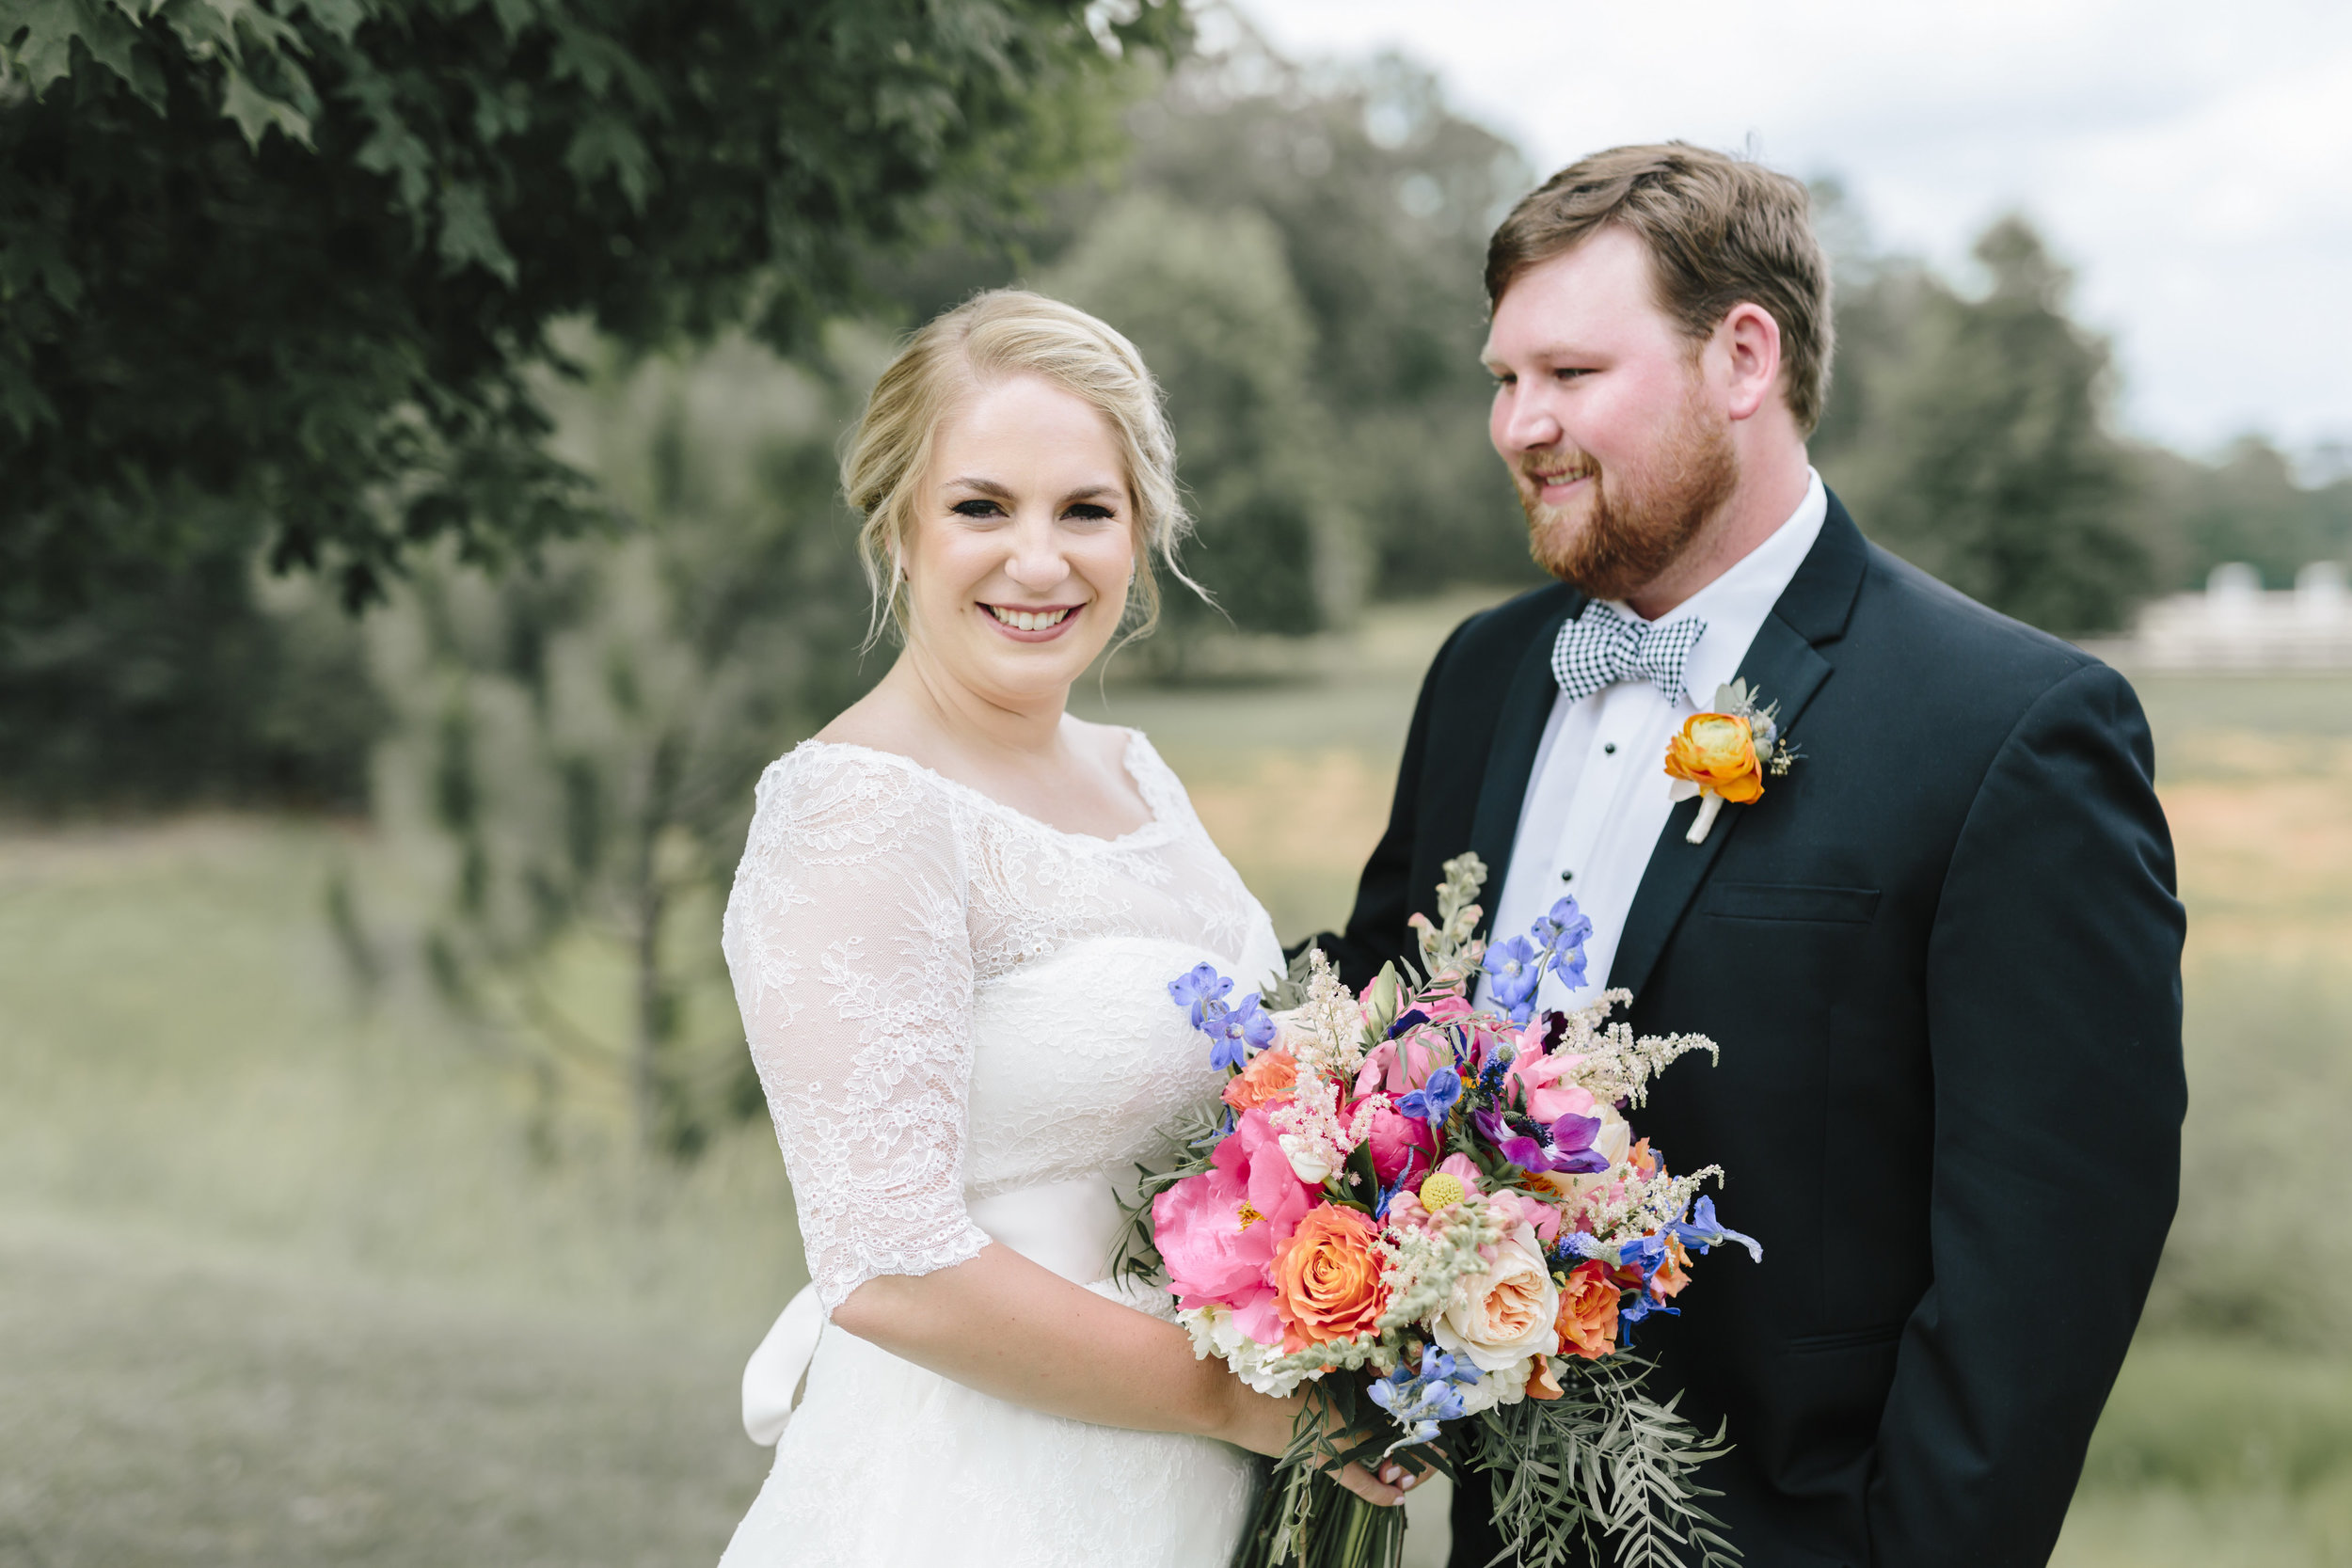 Sara Connor Wedding Day-First Look Couple Portraits-0053.jpg